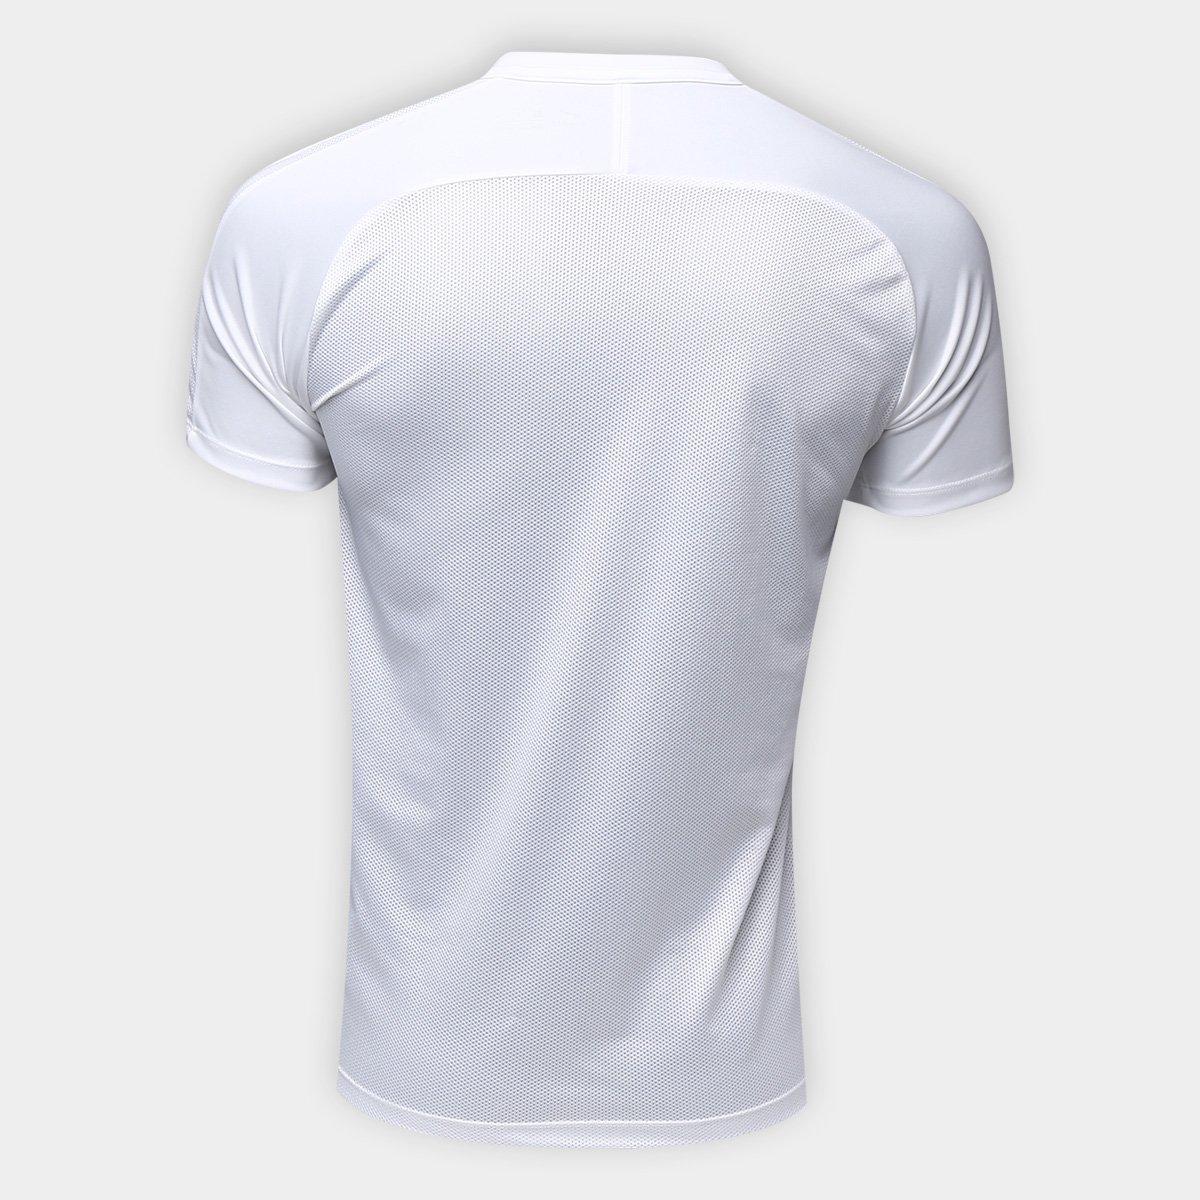 ... Camiseta Nike Dry Academy Top SS GX2 Masculina - Branco e Preto . 04fd1d62586c6